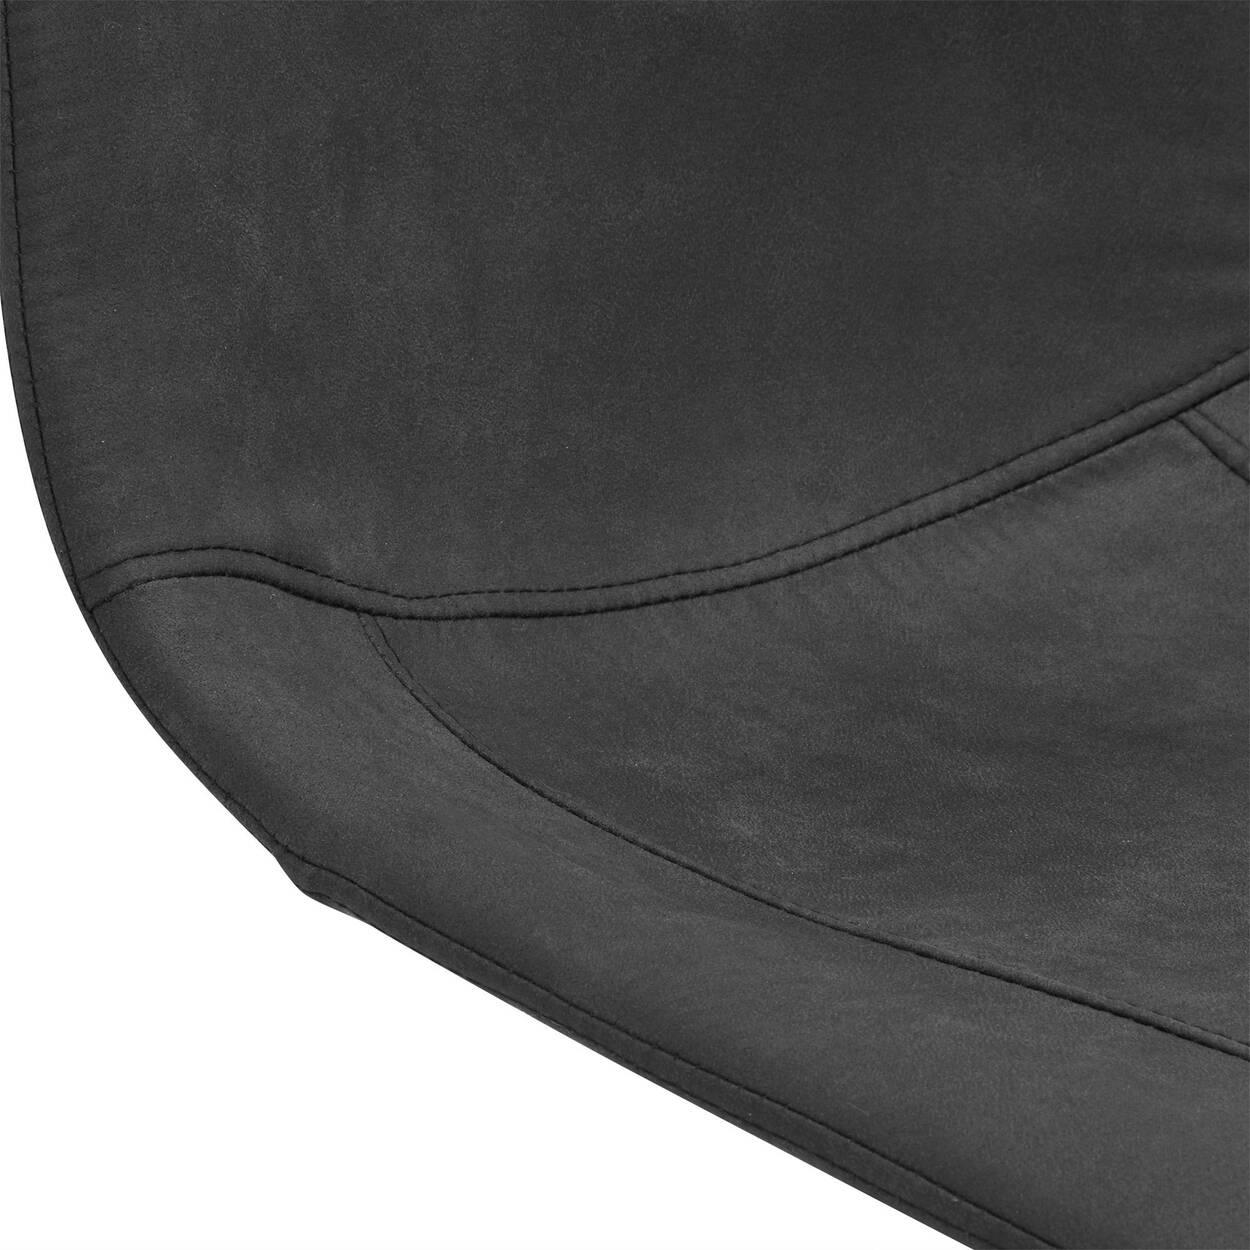 Textured Faux Leather & Metal Adjustable Bar Stool